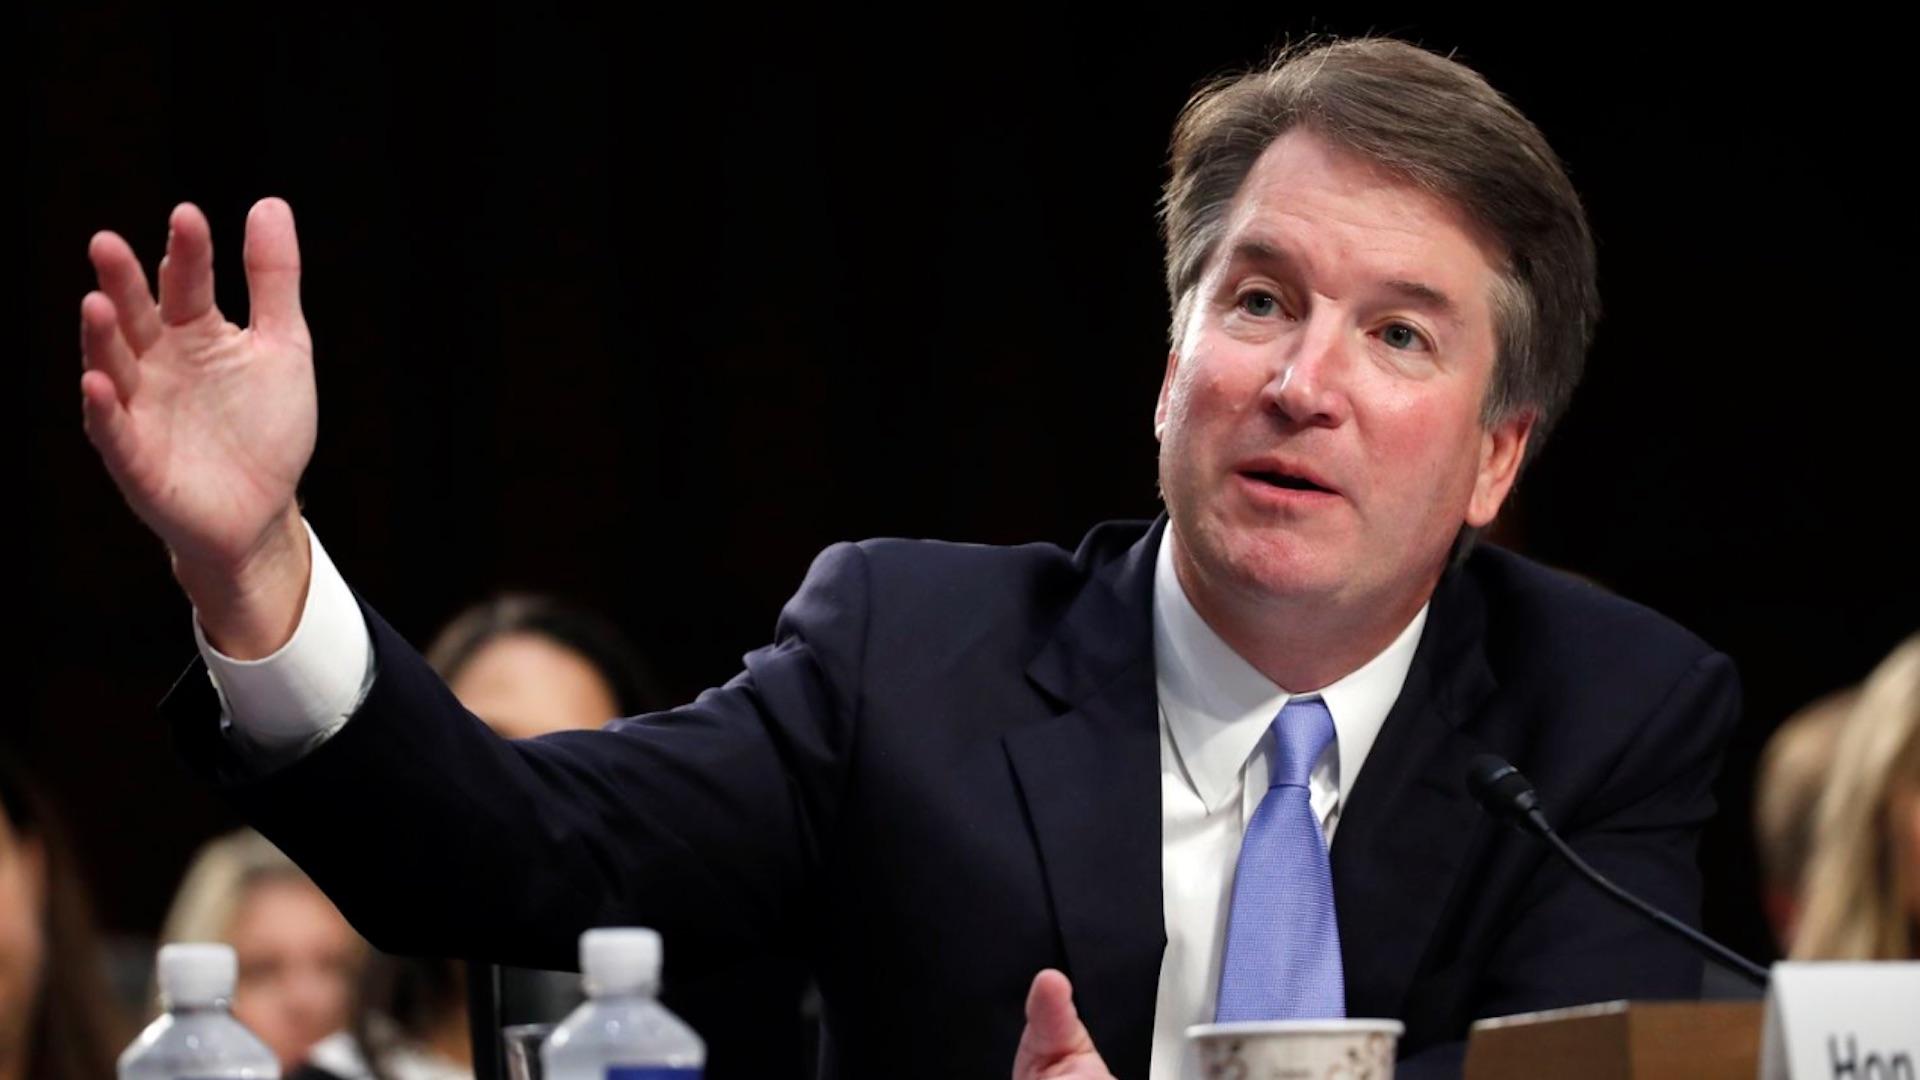 Brett Kavanaugh misled the Senate under oath. I cannot support his nomination.